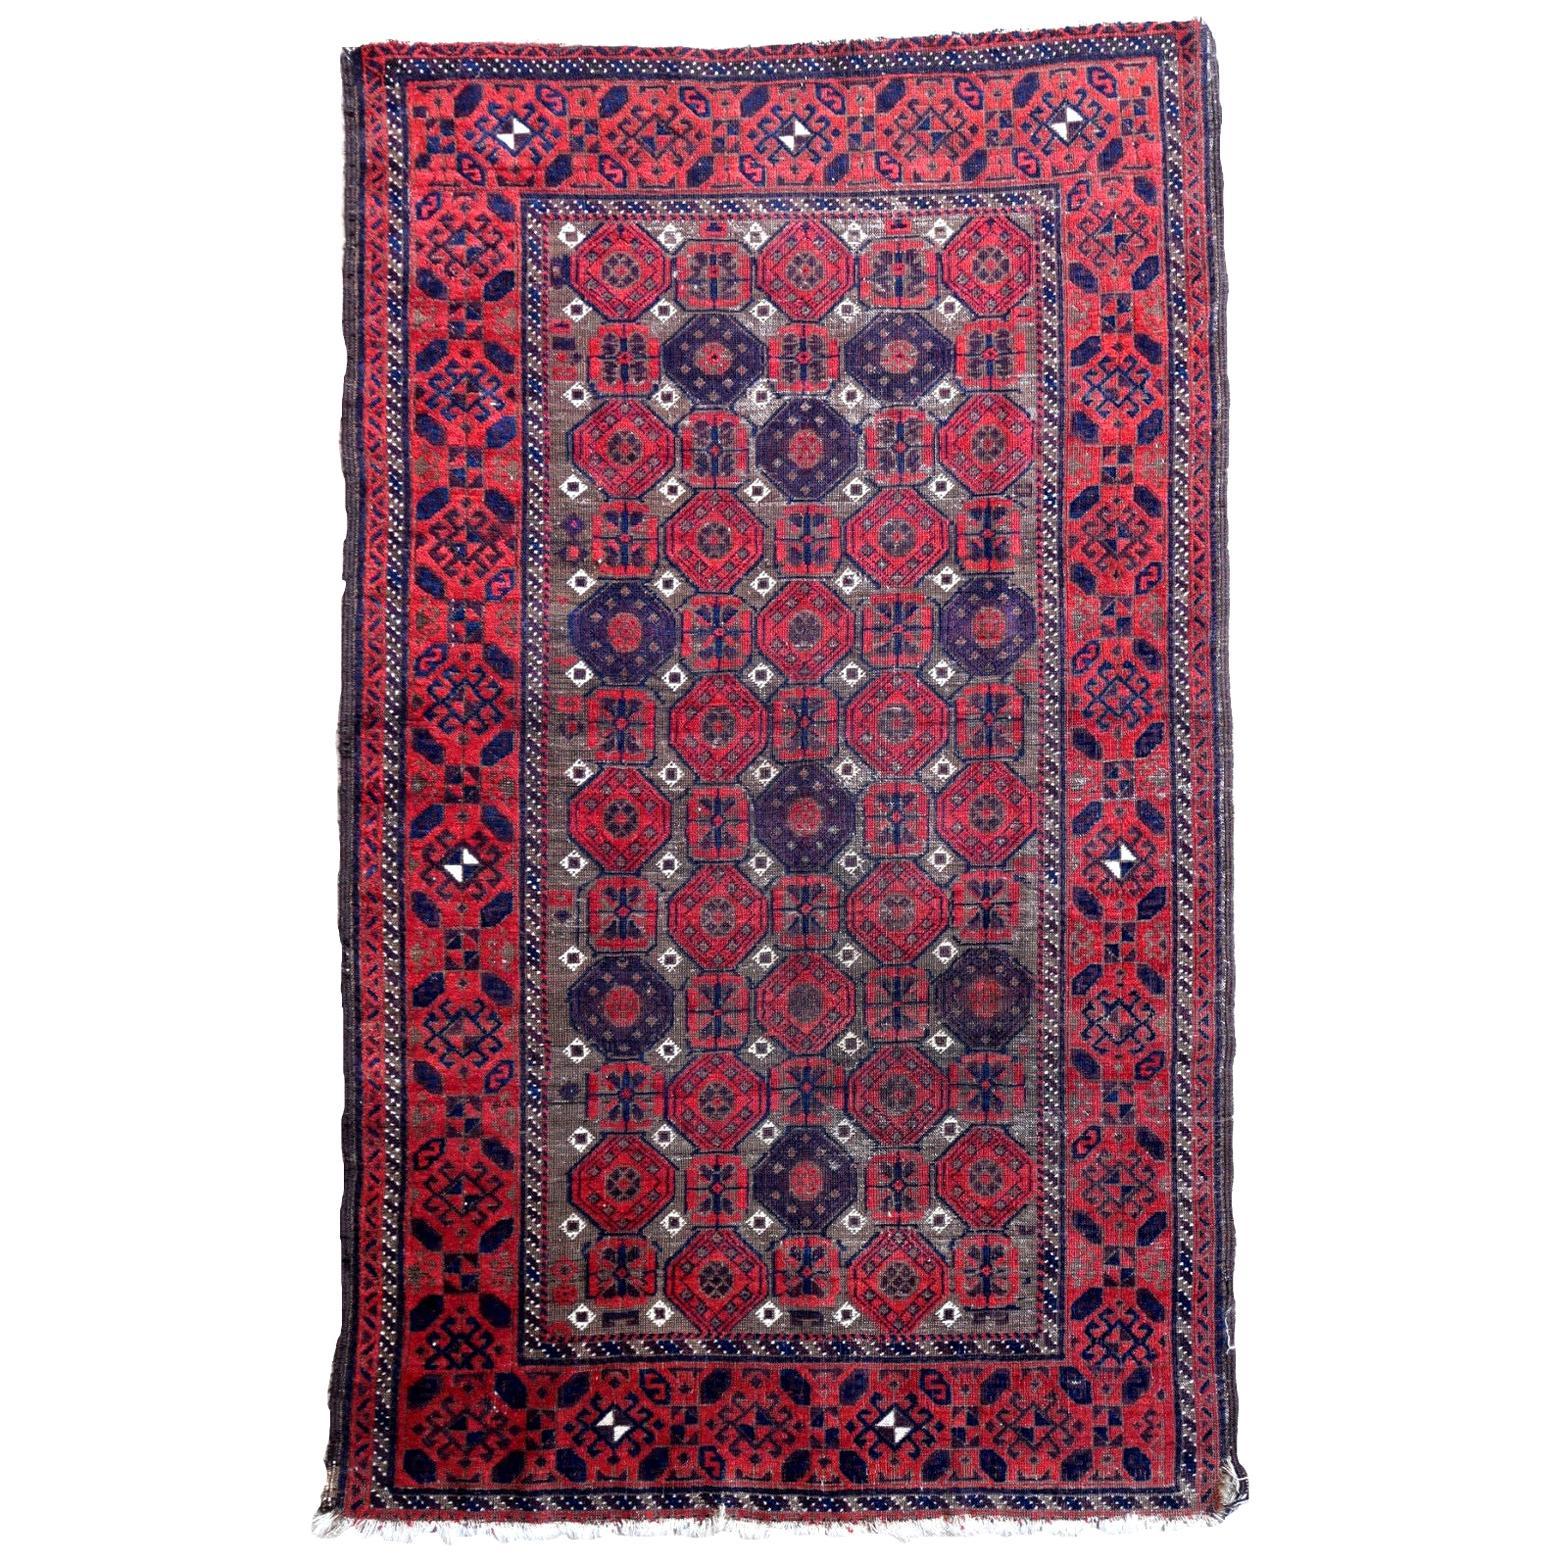 Handmade Antique Afghan Baluch Rug, 1900s, 1P77